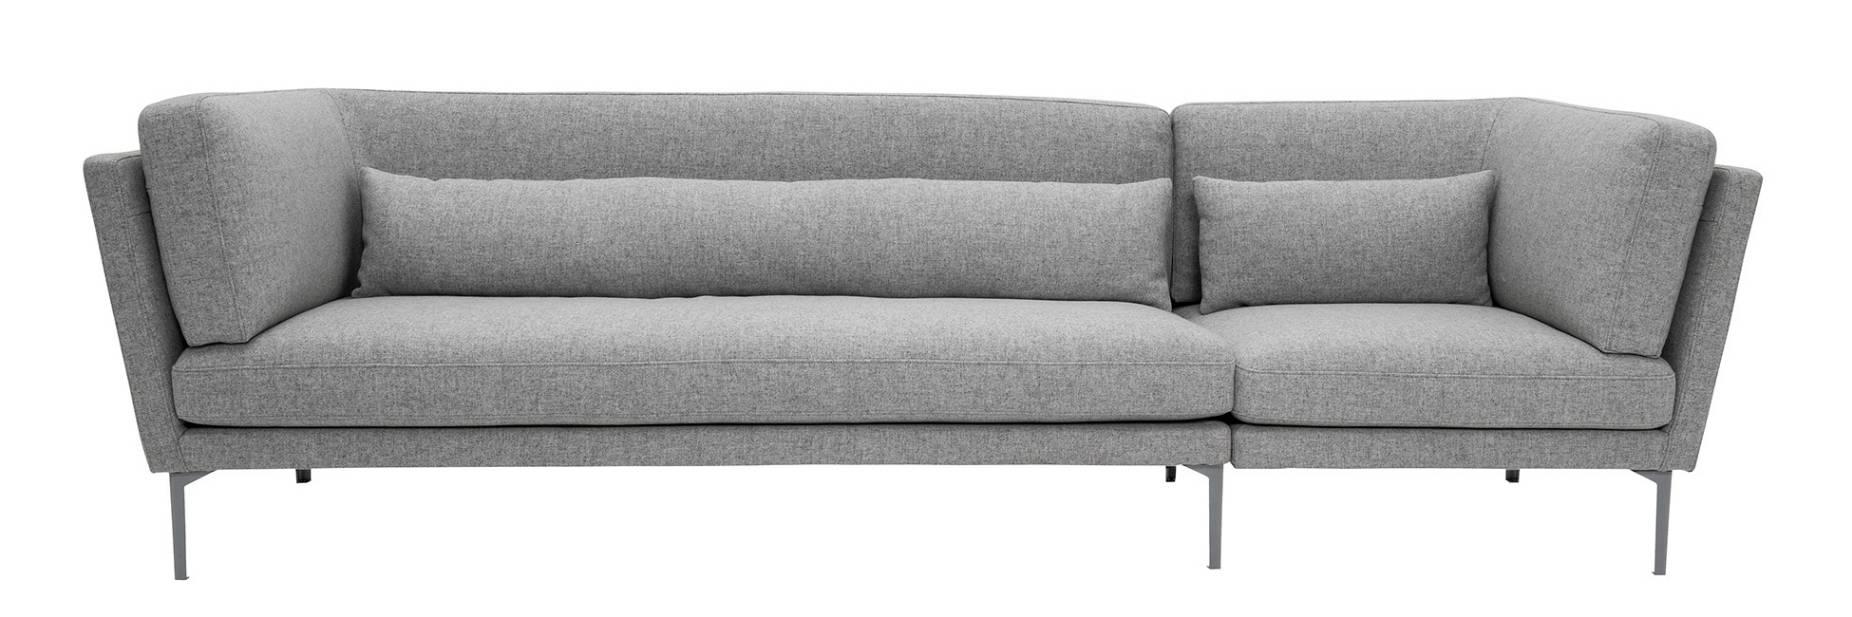 Bloomingville Rox Sofa Design Möbel